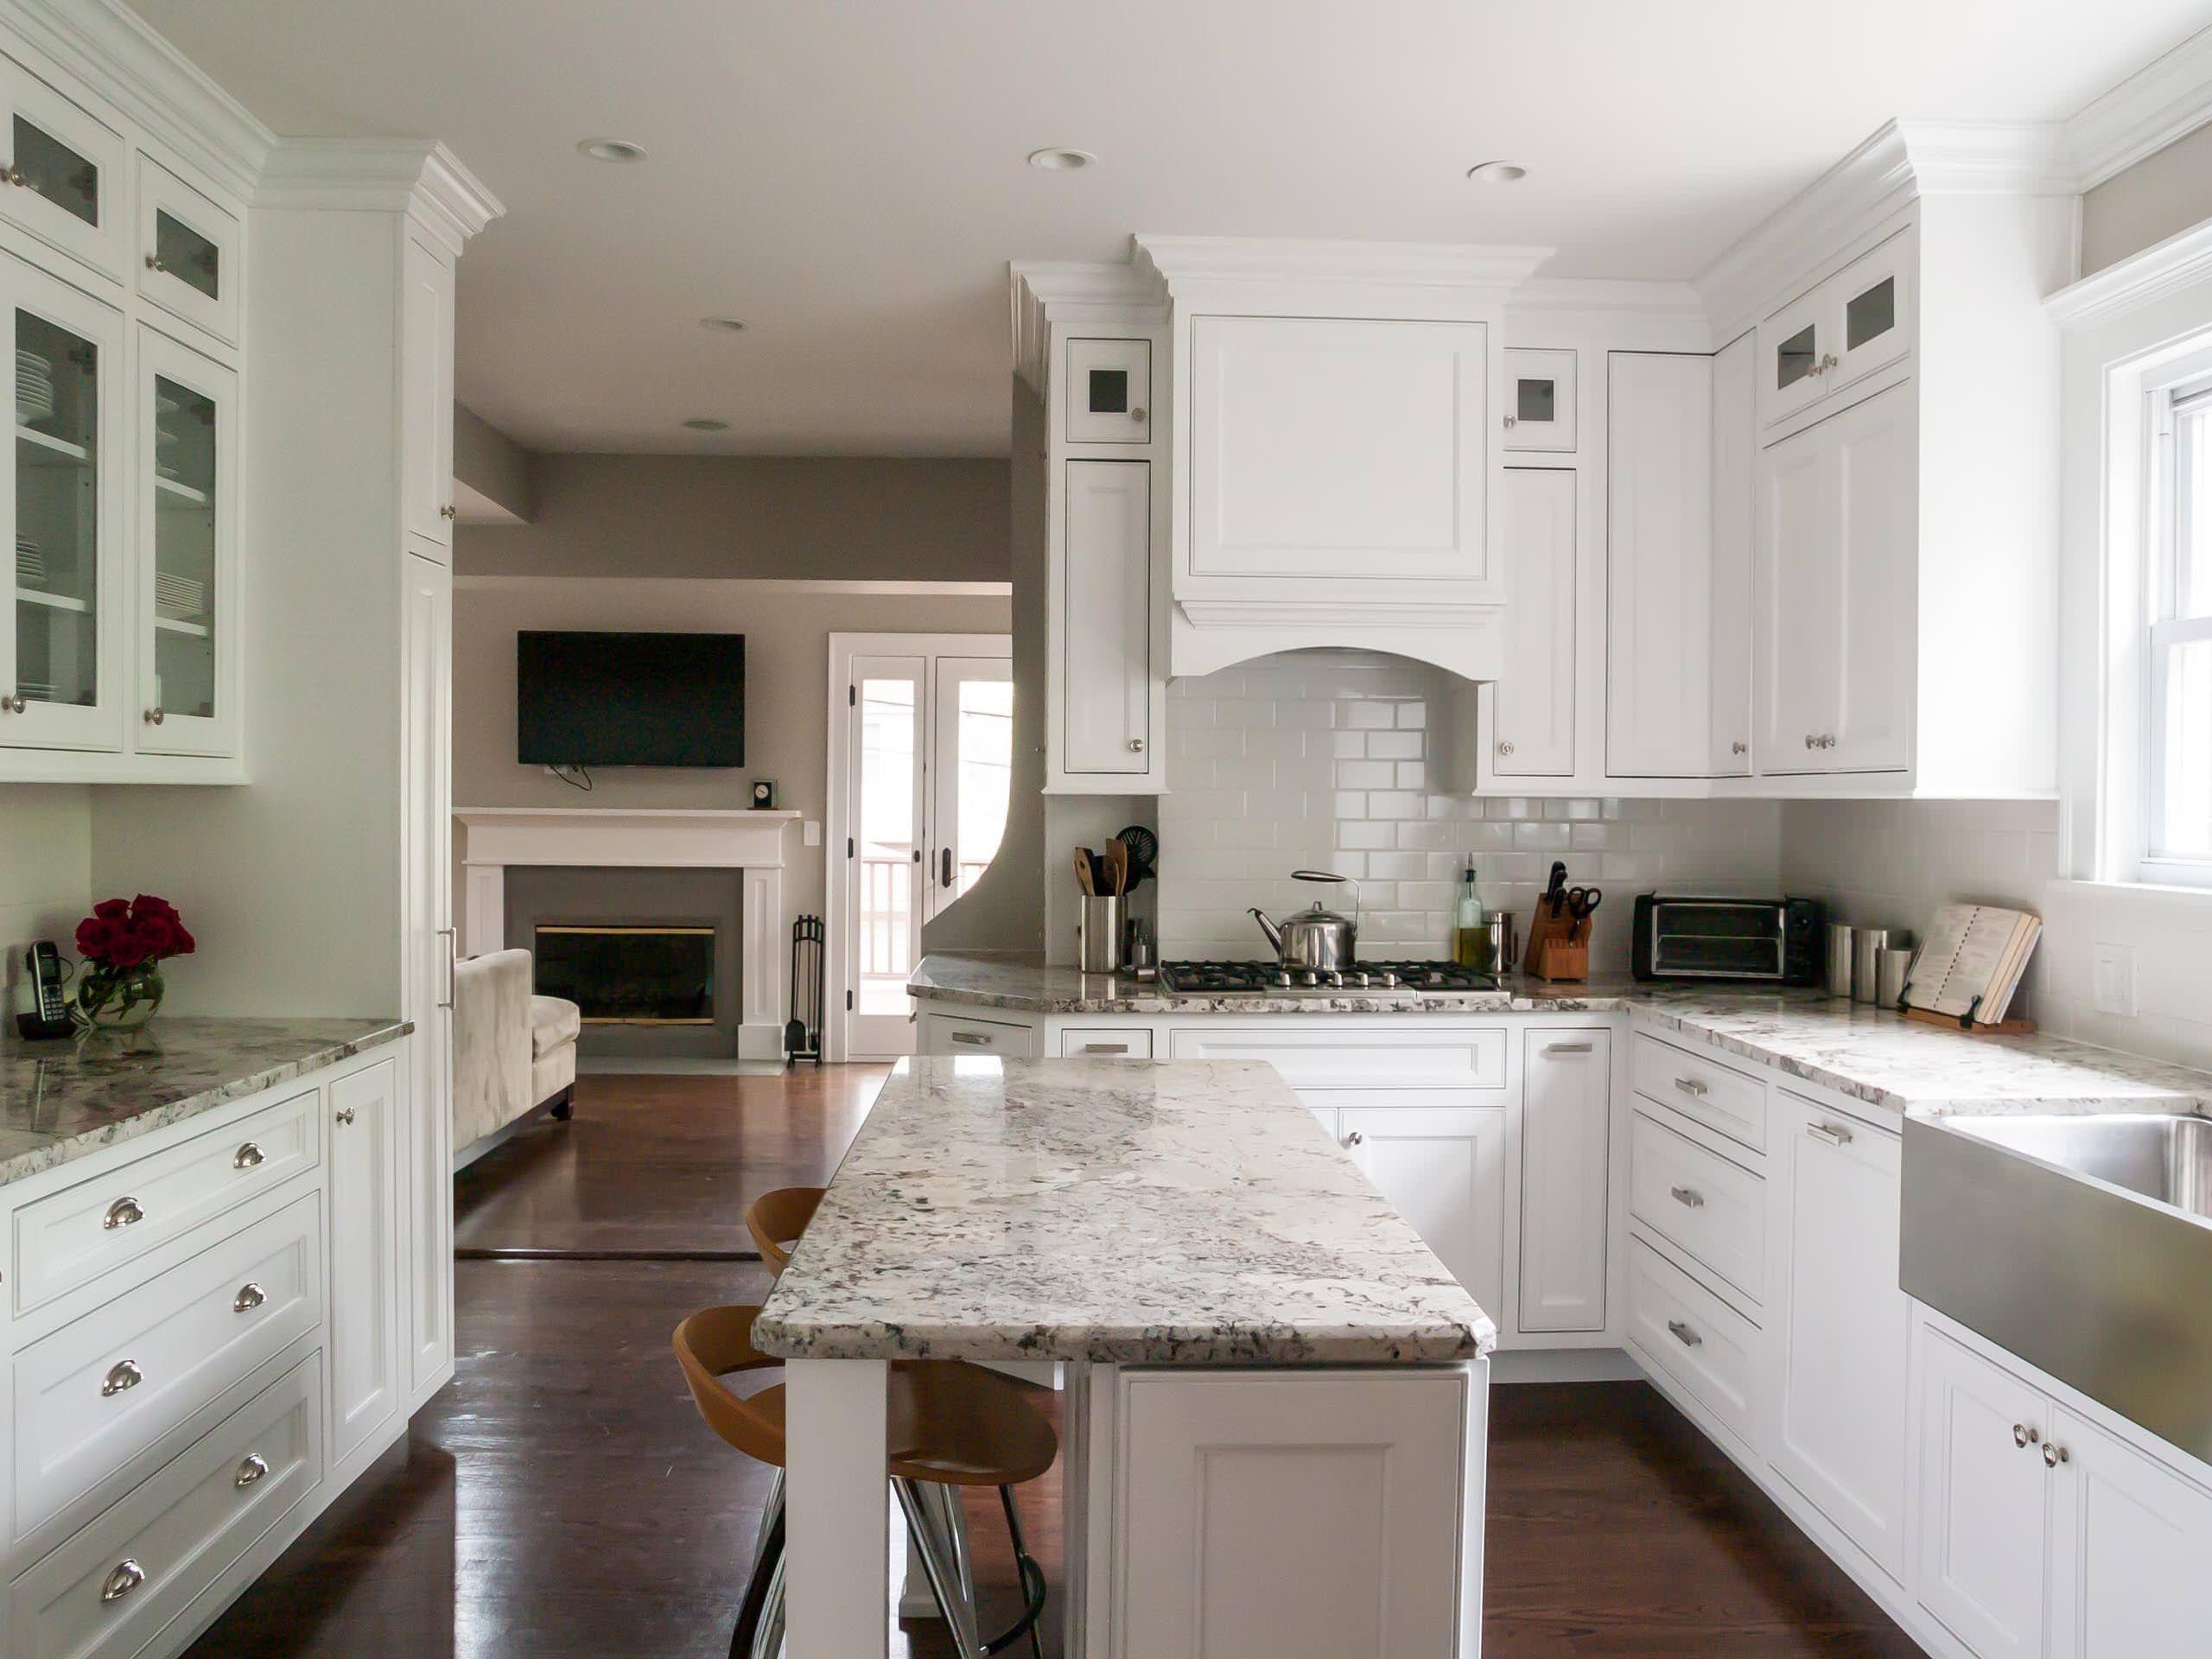 White Kitchen Cabinet With Silver Handle And Santa Cecilia Granite Narrow Kitchen Island Kitchen Island Dimensions Kitchen Designs Layout